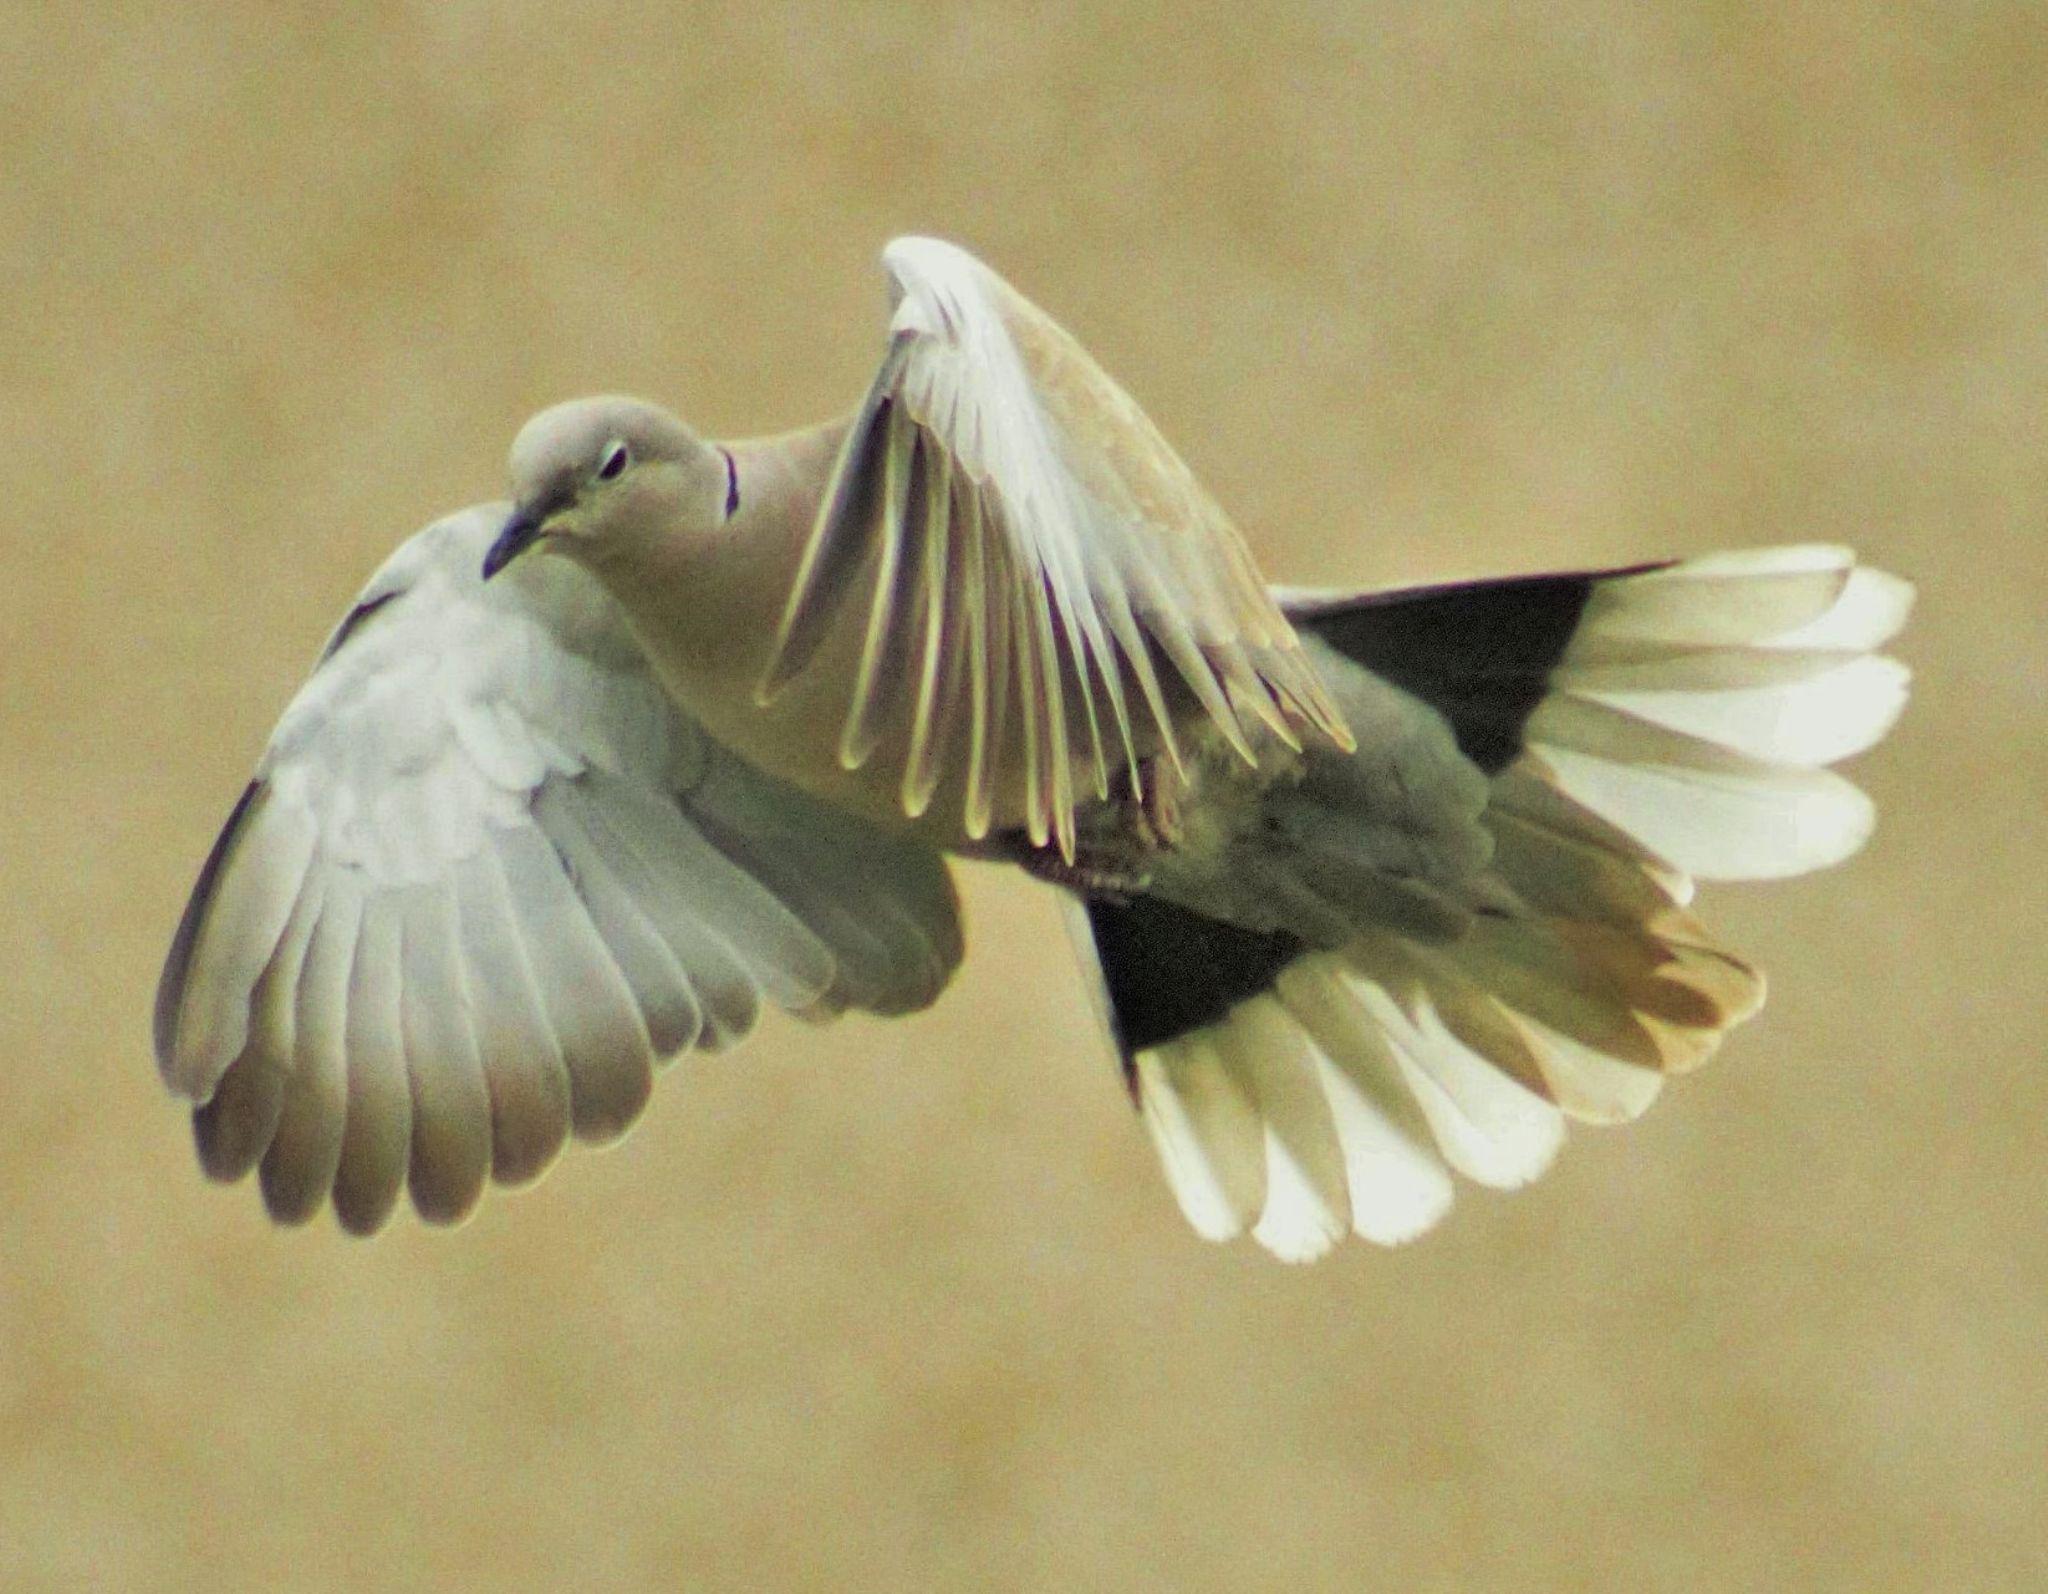 A Dove in flight. by sidoneill1